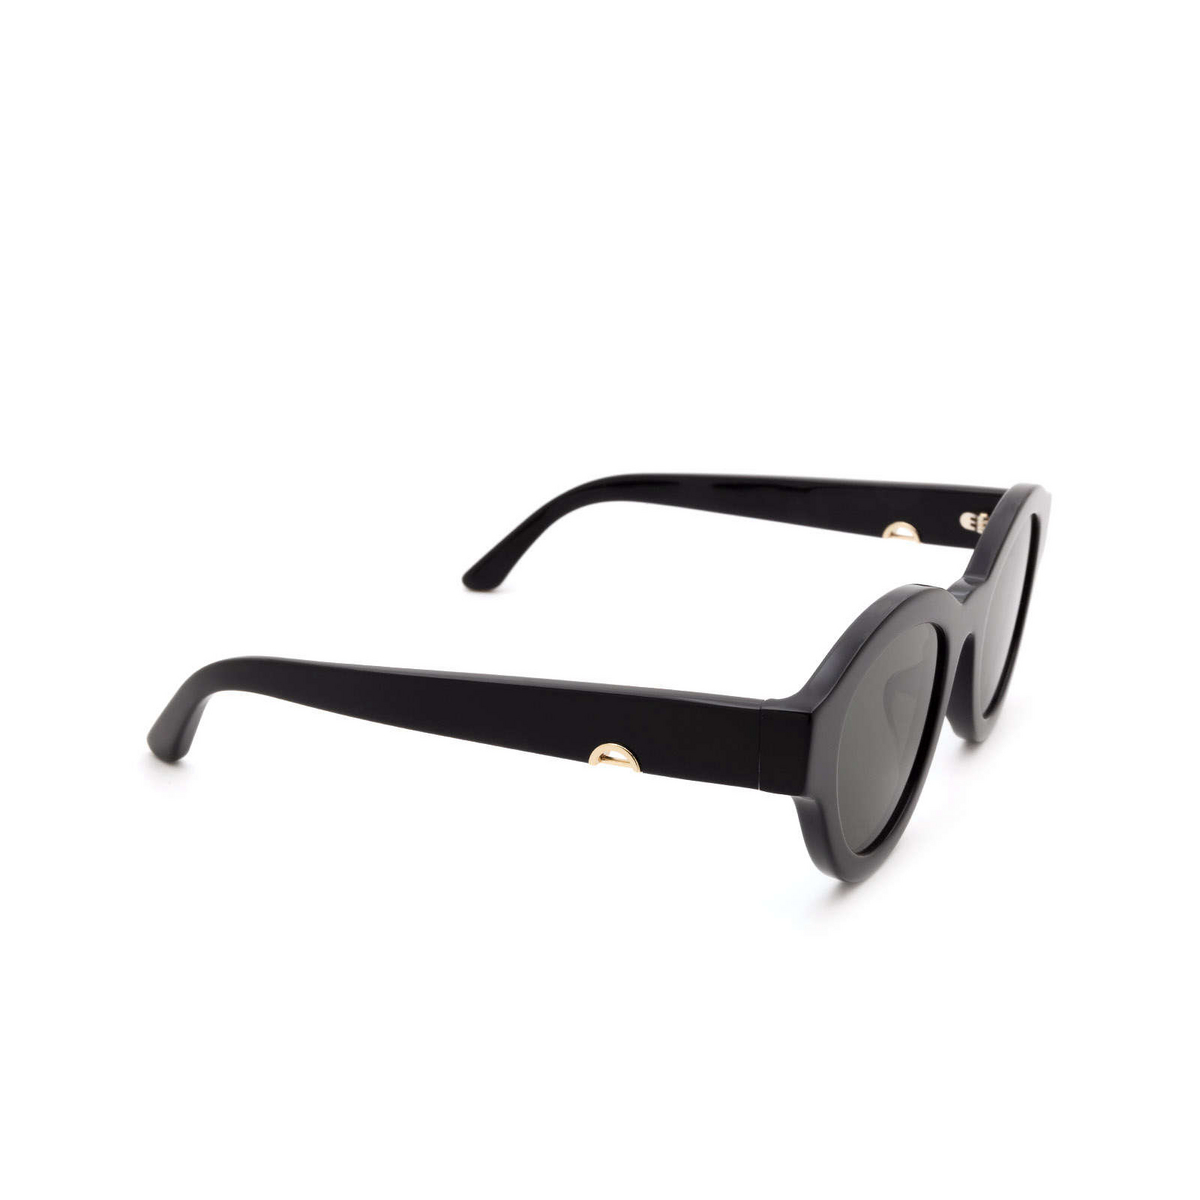 Huma® Cat-eye Sunglasses: Dug color Black 06 - three-quarters view.